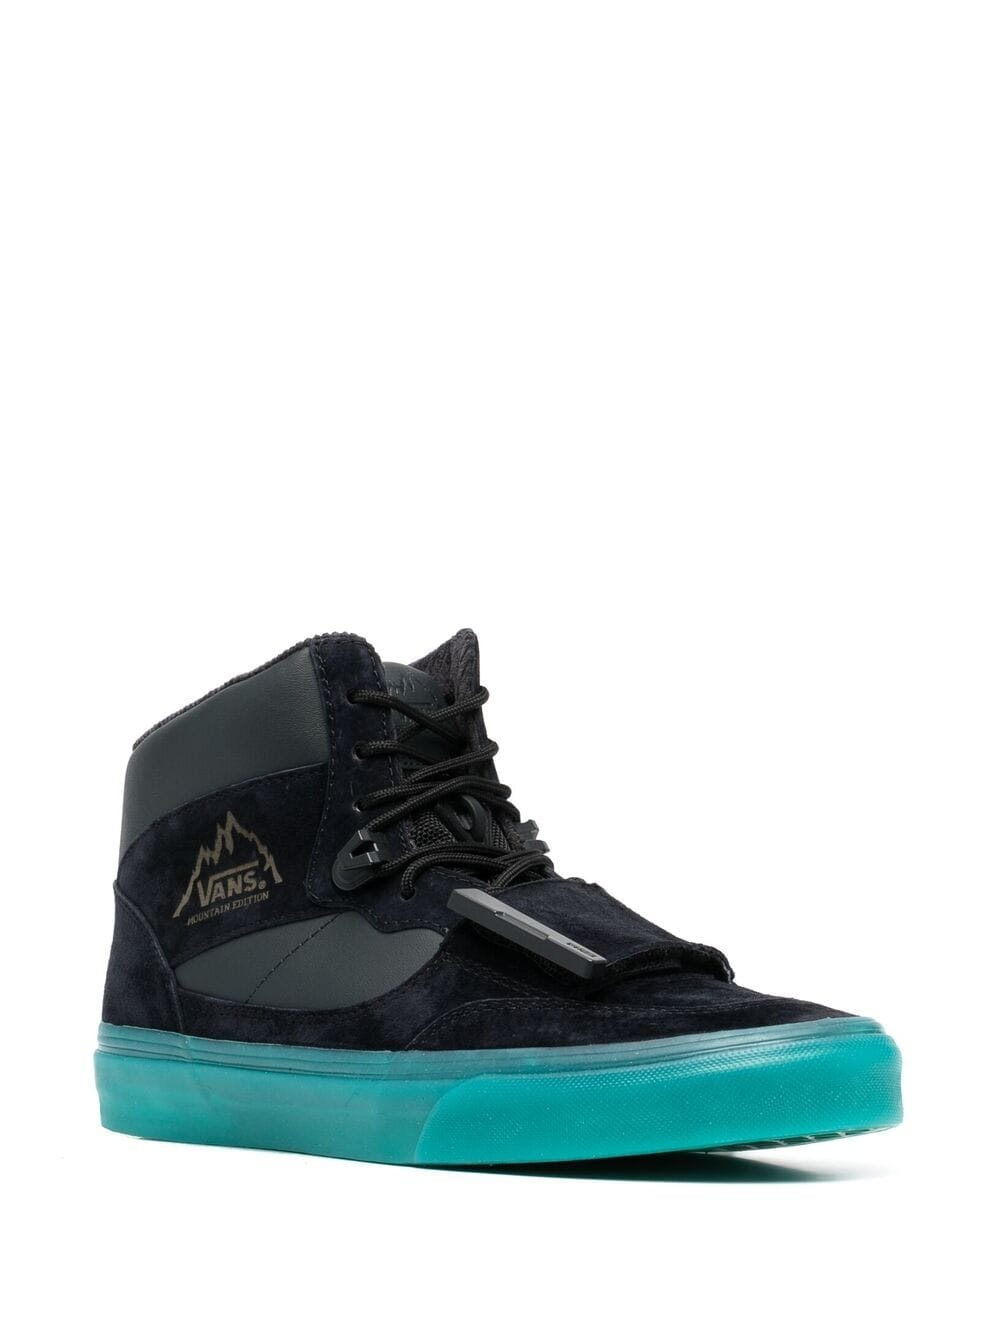 Vans vault sneakers mountain editional x c2h4 man black VANS VAULT | Sneakers | VN0A3TKG5ZB1